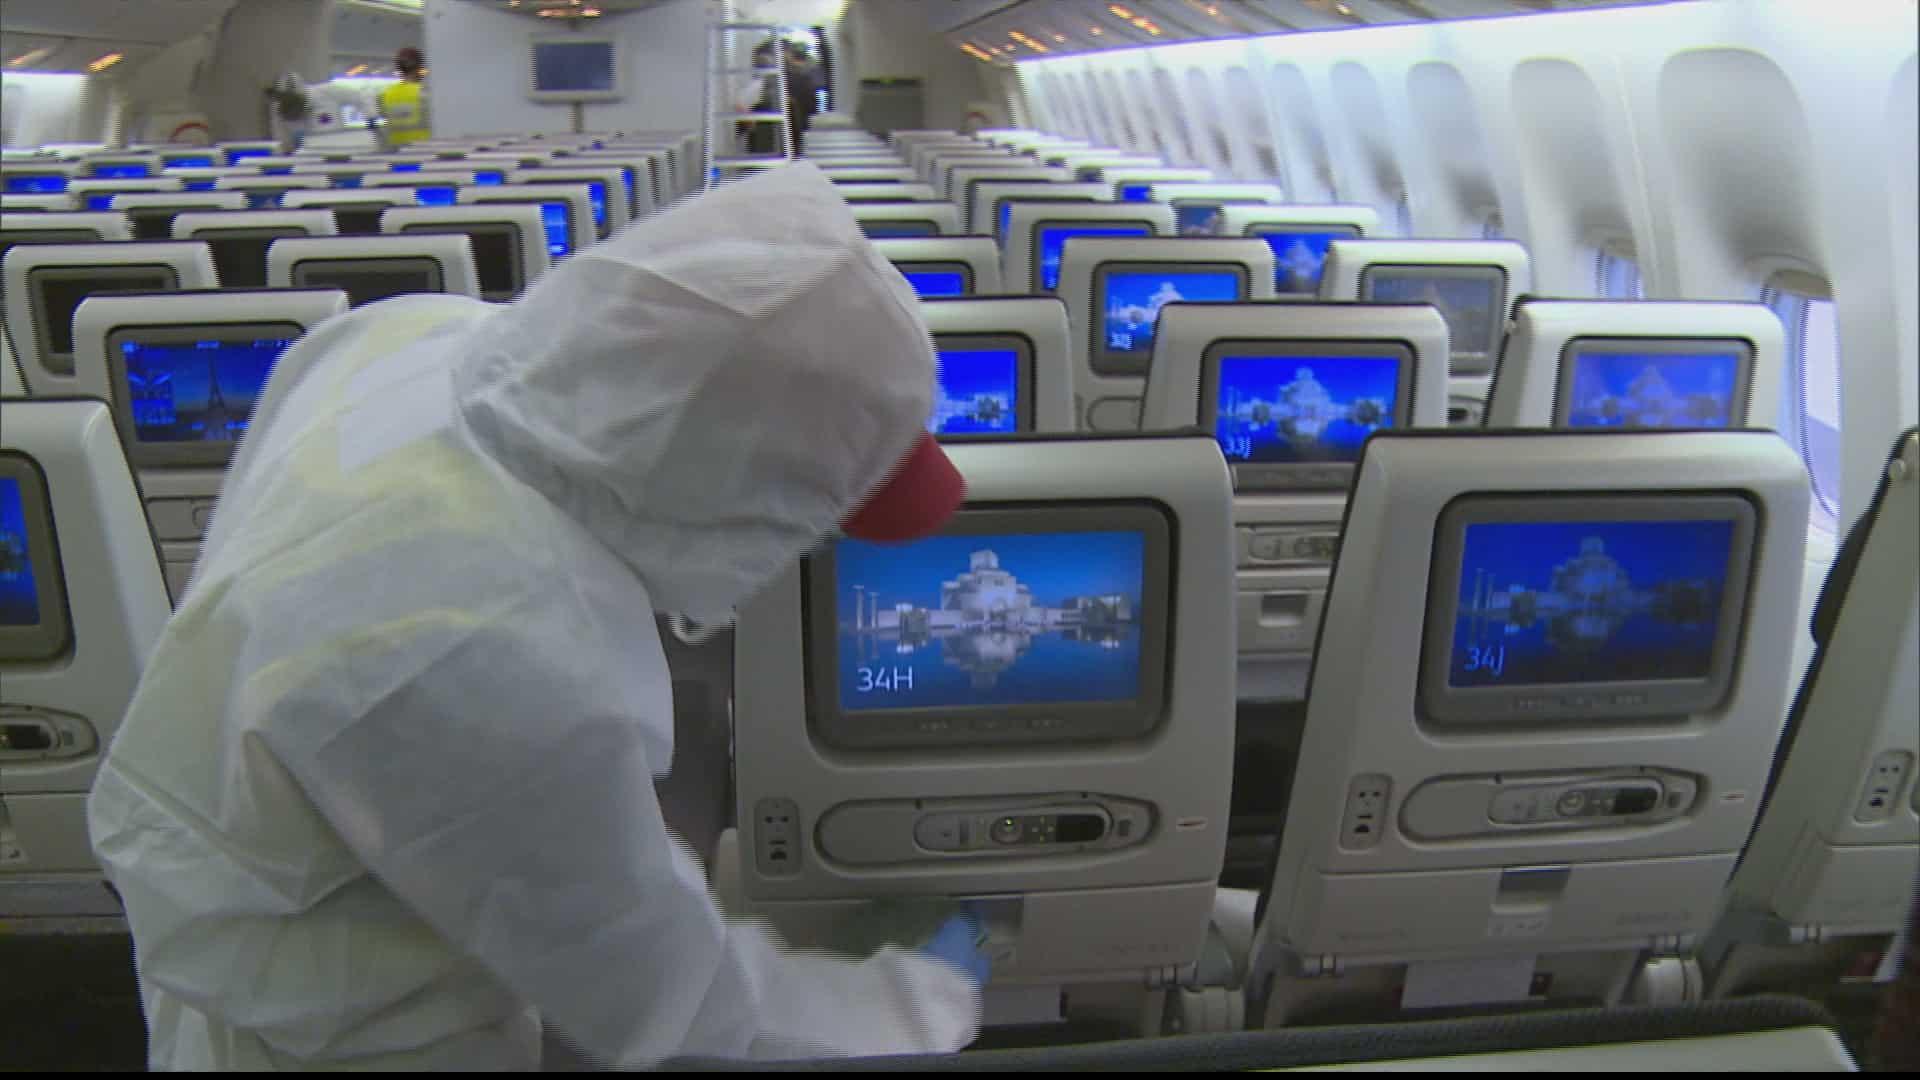 Aviation: Qatar Airways To Scale Up Services, Cut Jobs